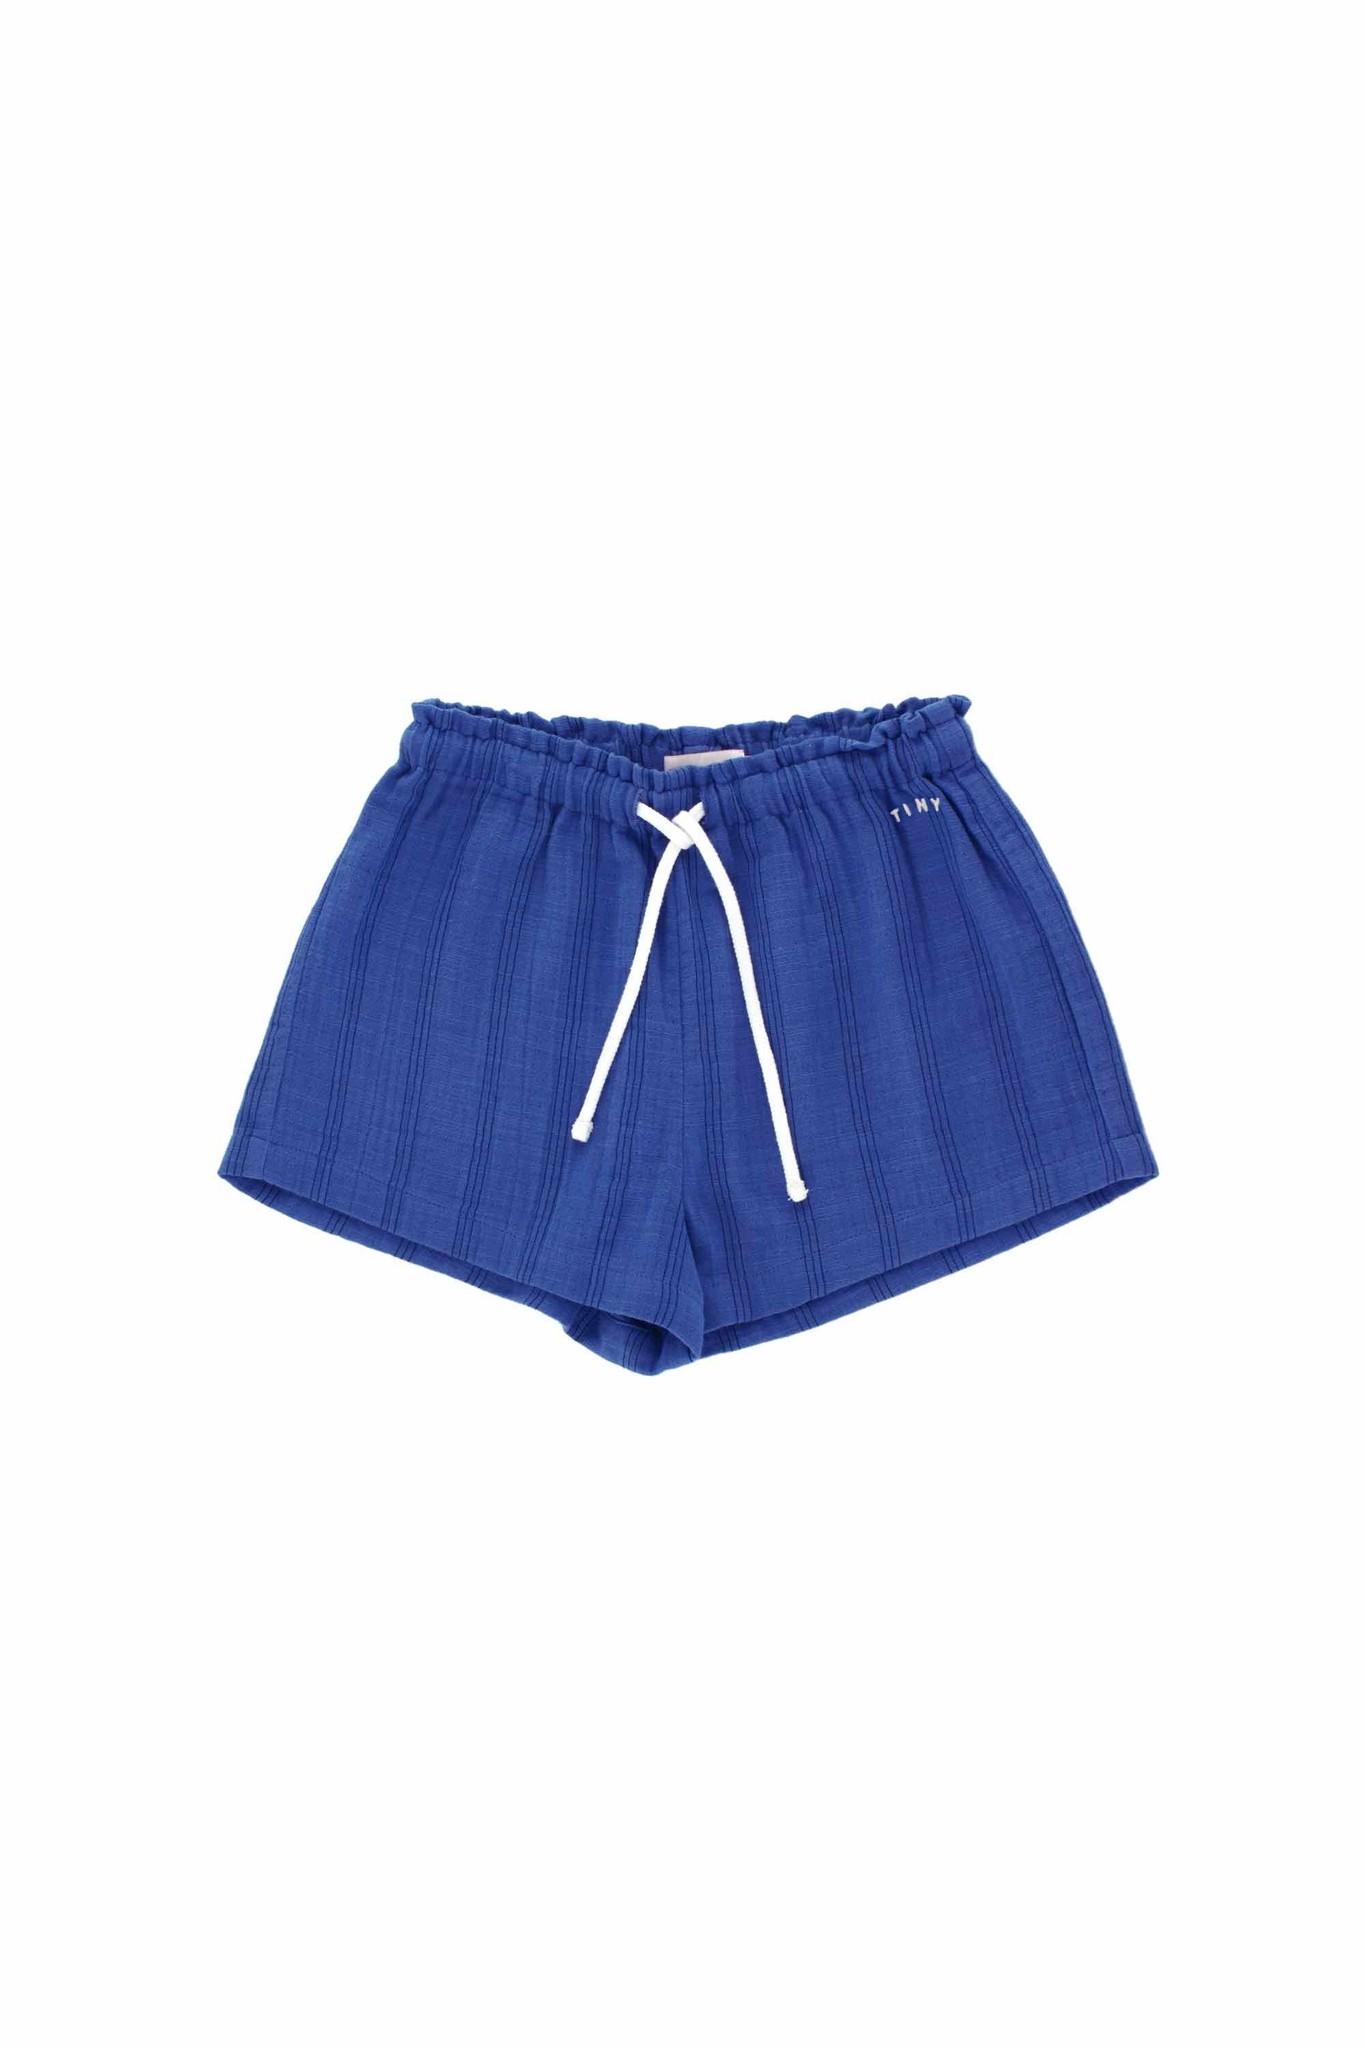 Stripes Tiny short - Iris Blue / Ink Blue-1